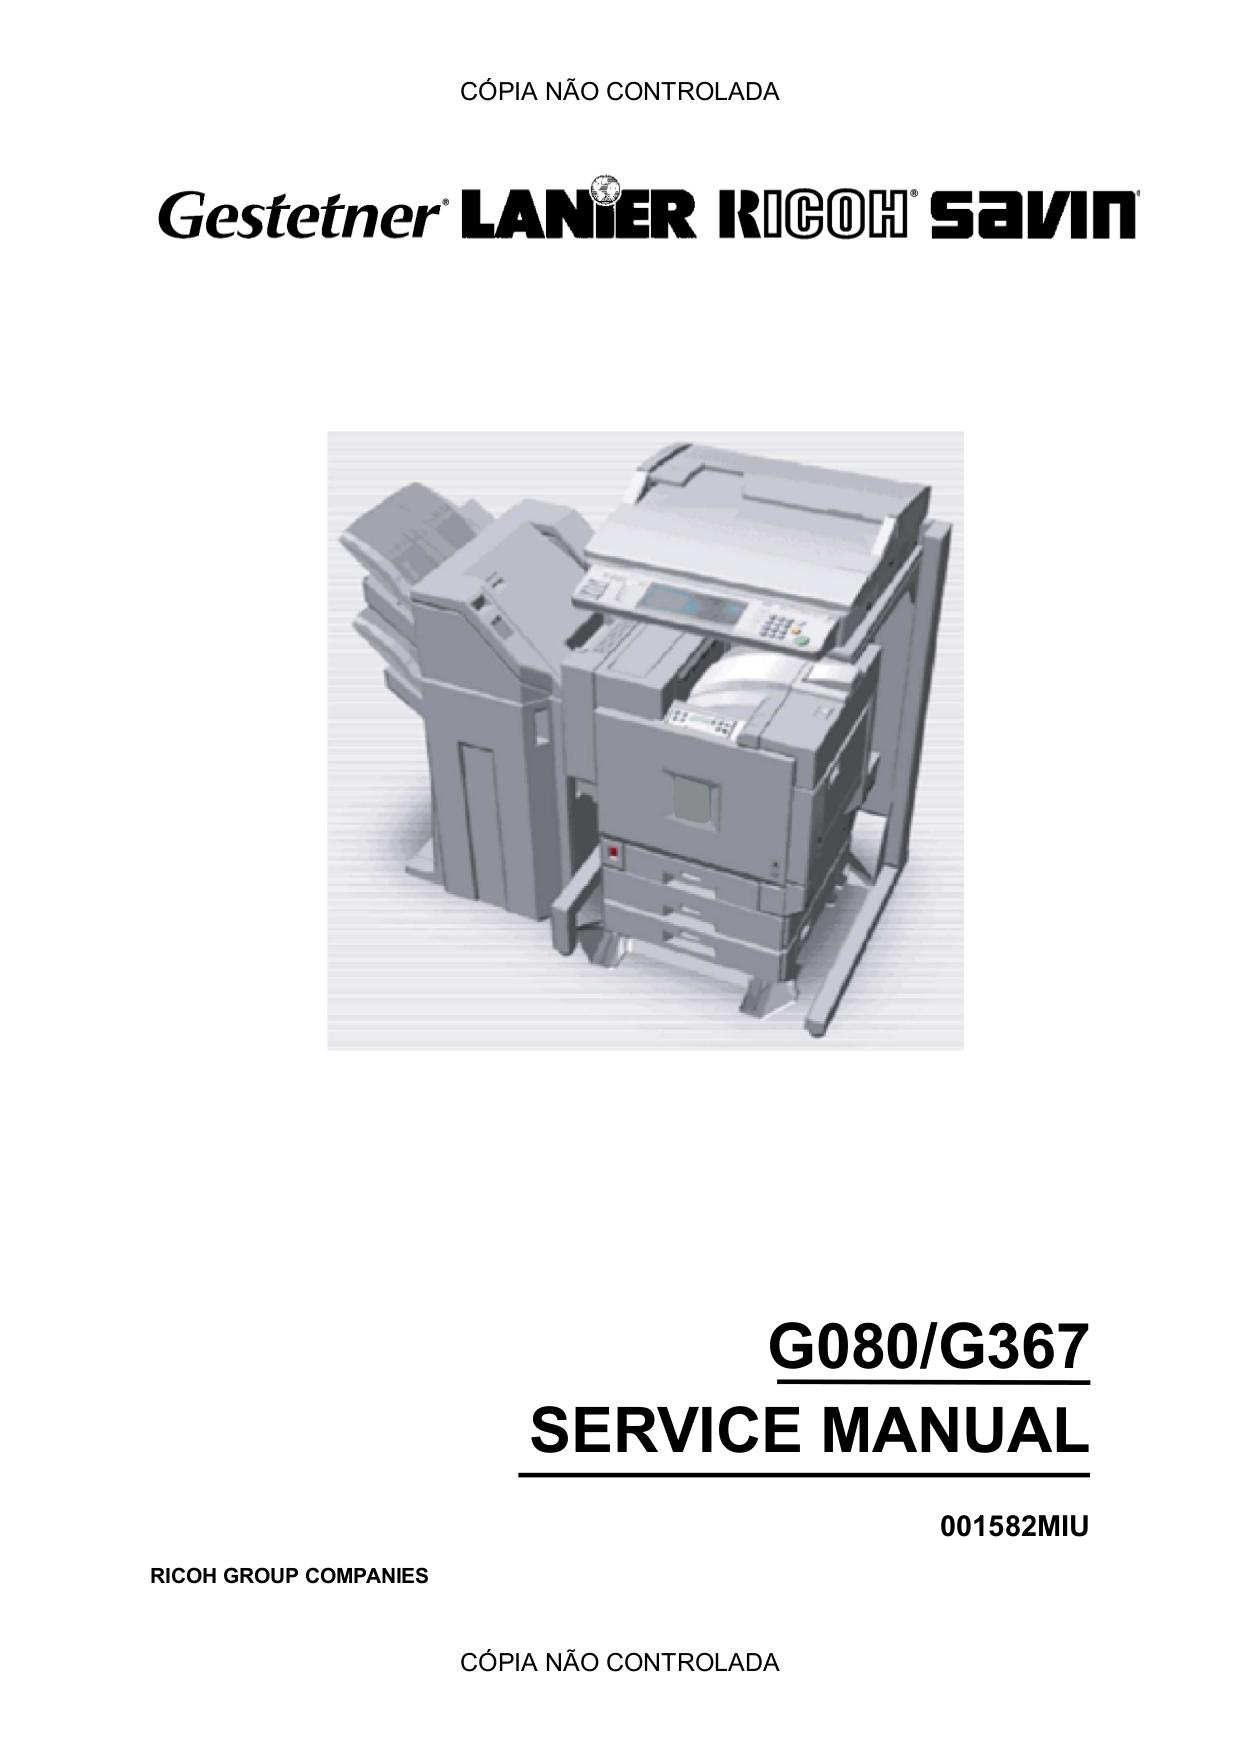 ricoh aficio cl7000 manual online user manual u2022 rh pandadigital co ricoh aficio cl 7000 service manual Ricoh C3300 Toner Cartridges